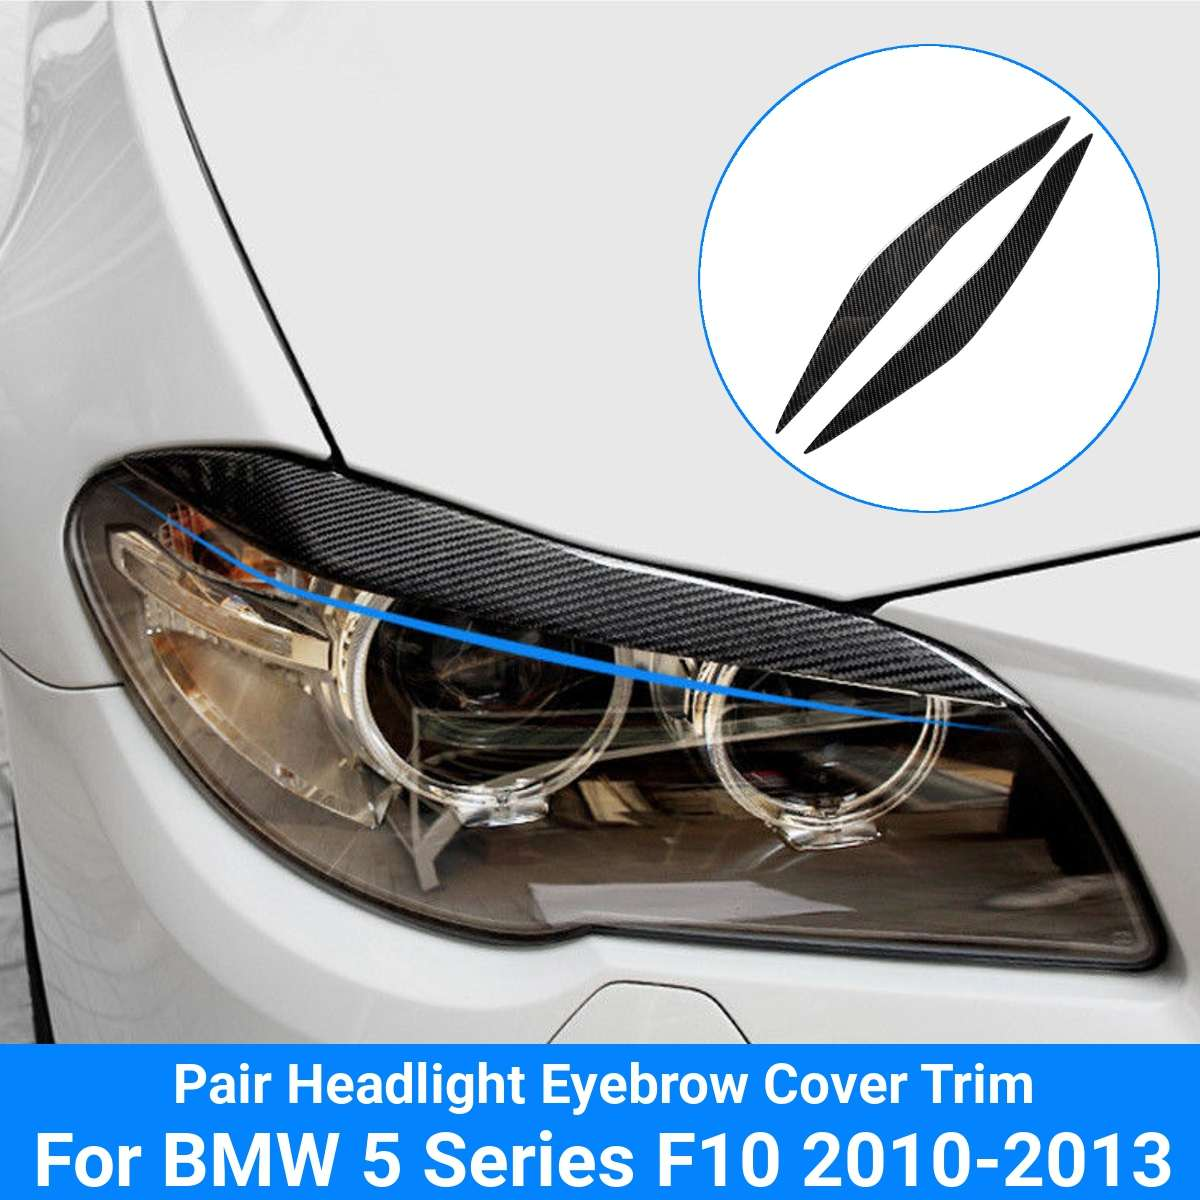 Carbon Fiber Headlight Eyelid Eyebrow Cover For Bmw E90 E91 328i 335i 2006 2011 5 Series F10 2010 2013 Headlight Protector Leather Bag